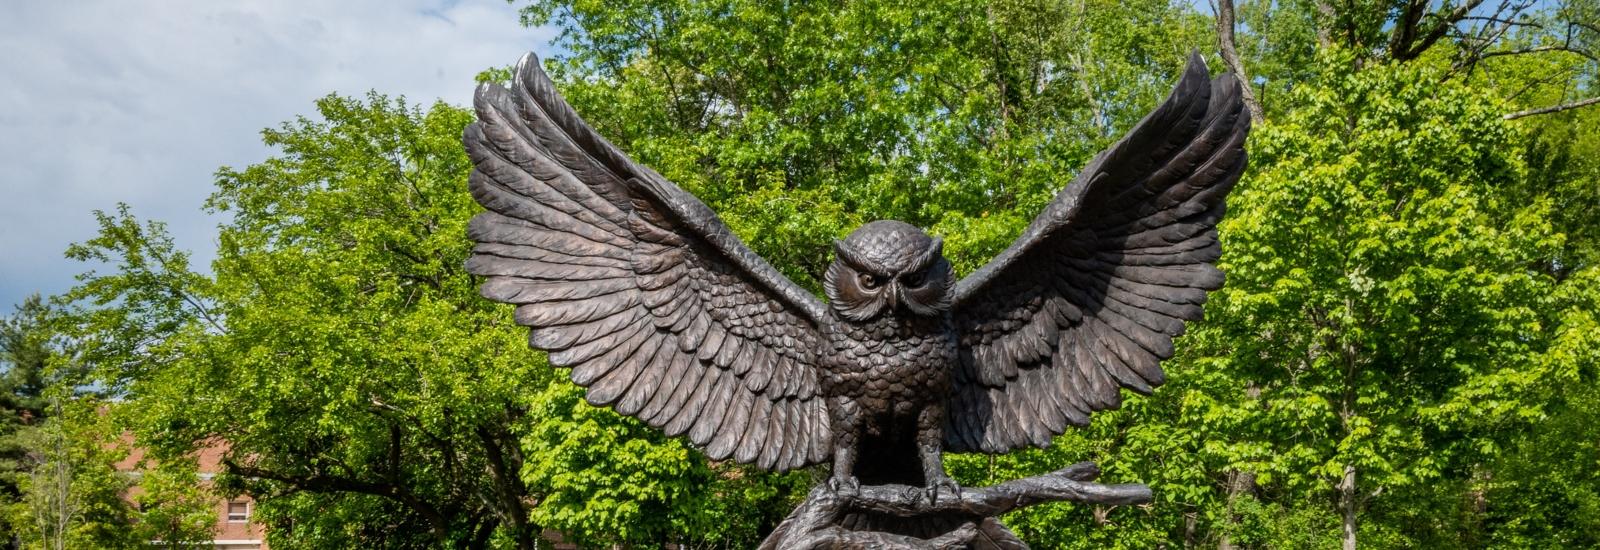 The Rowan Prof Statue.